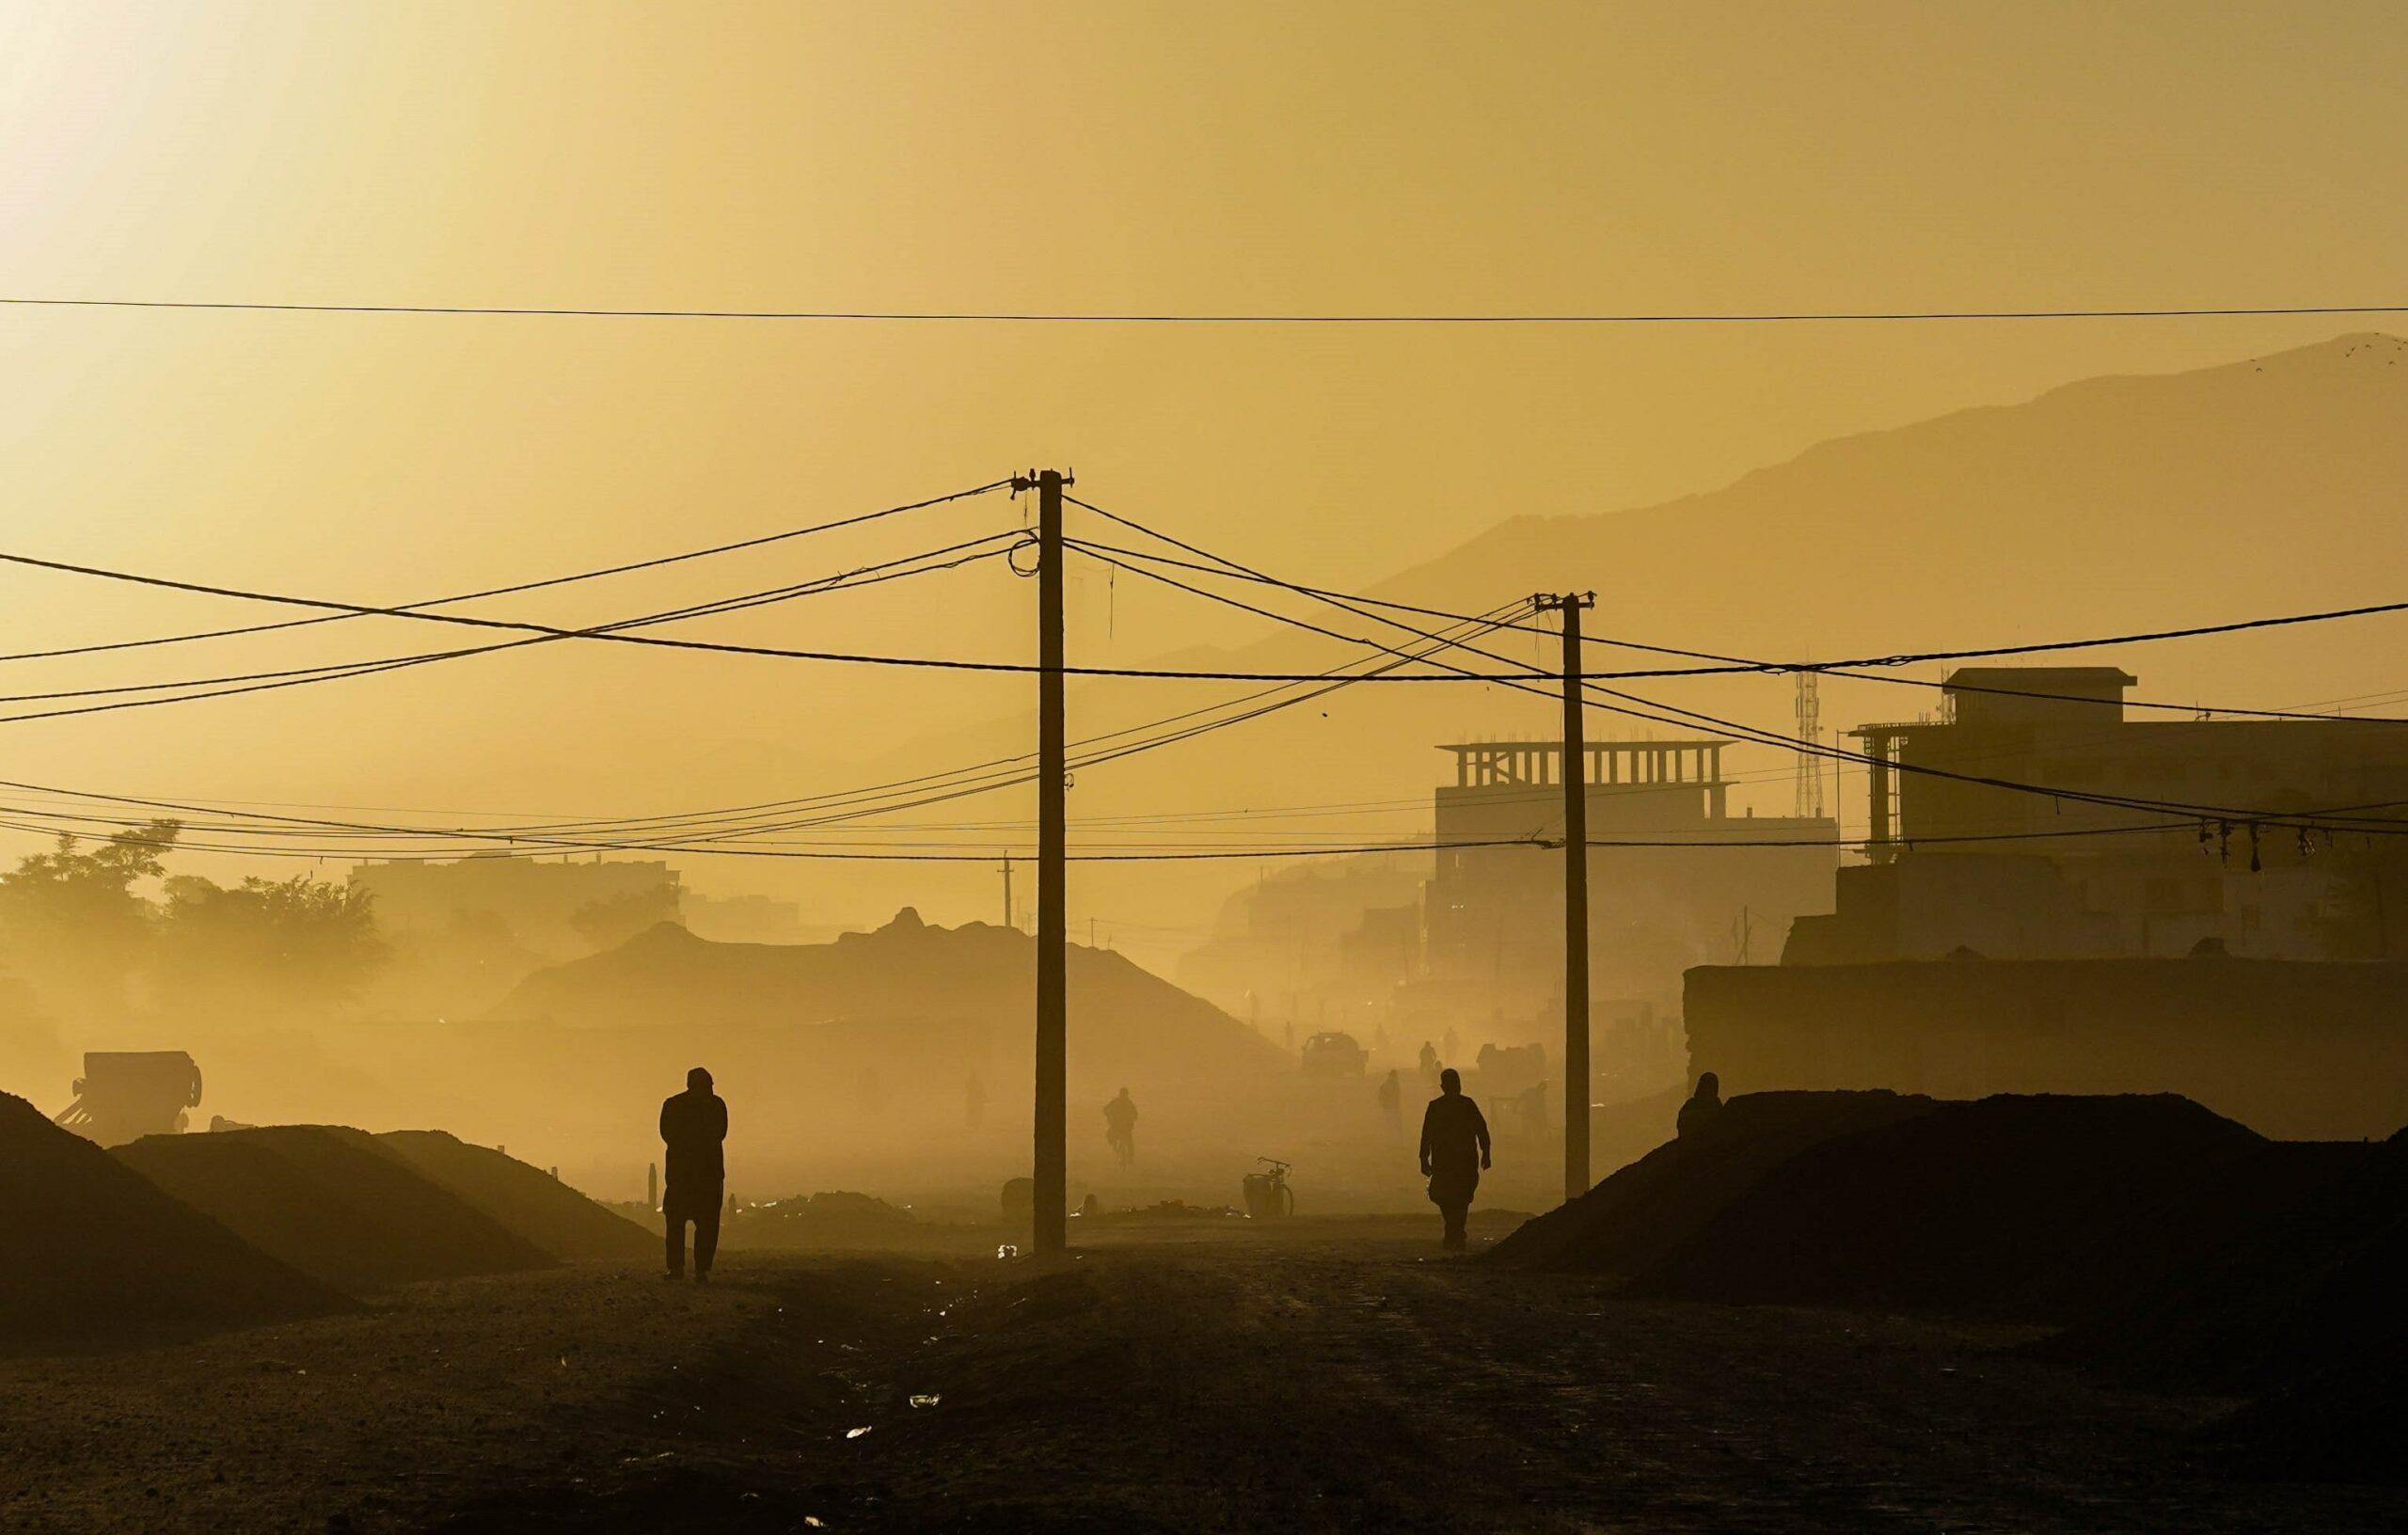 Debacle in Afghanistan Symptom of Confusion at Home